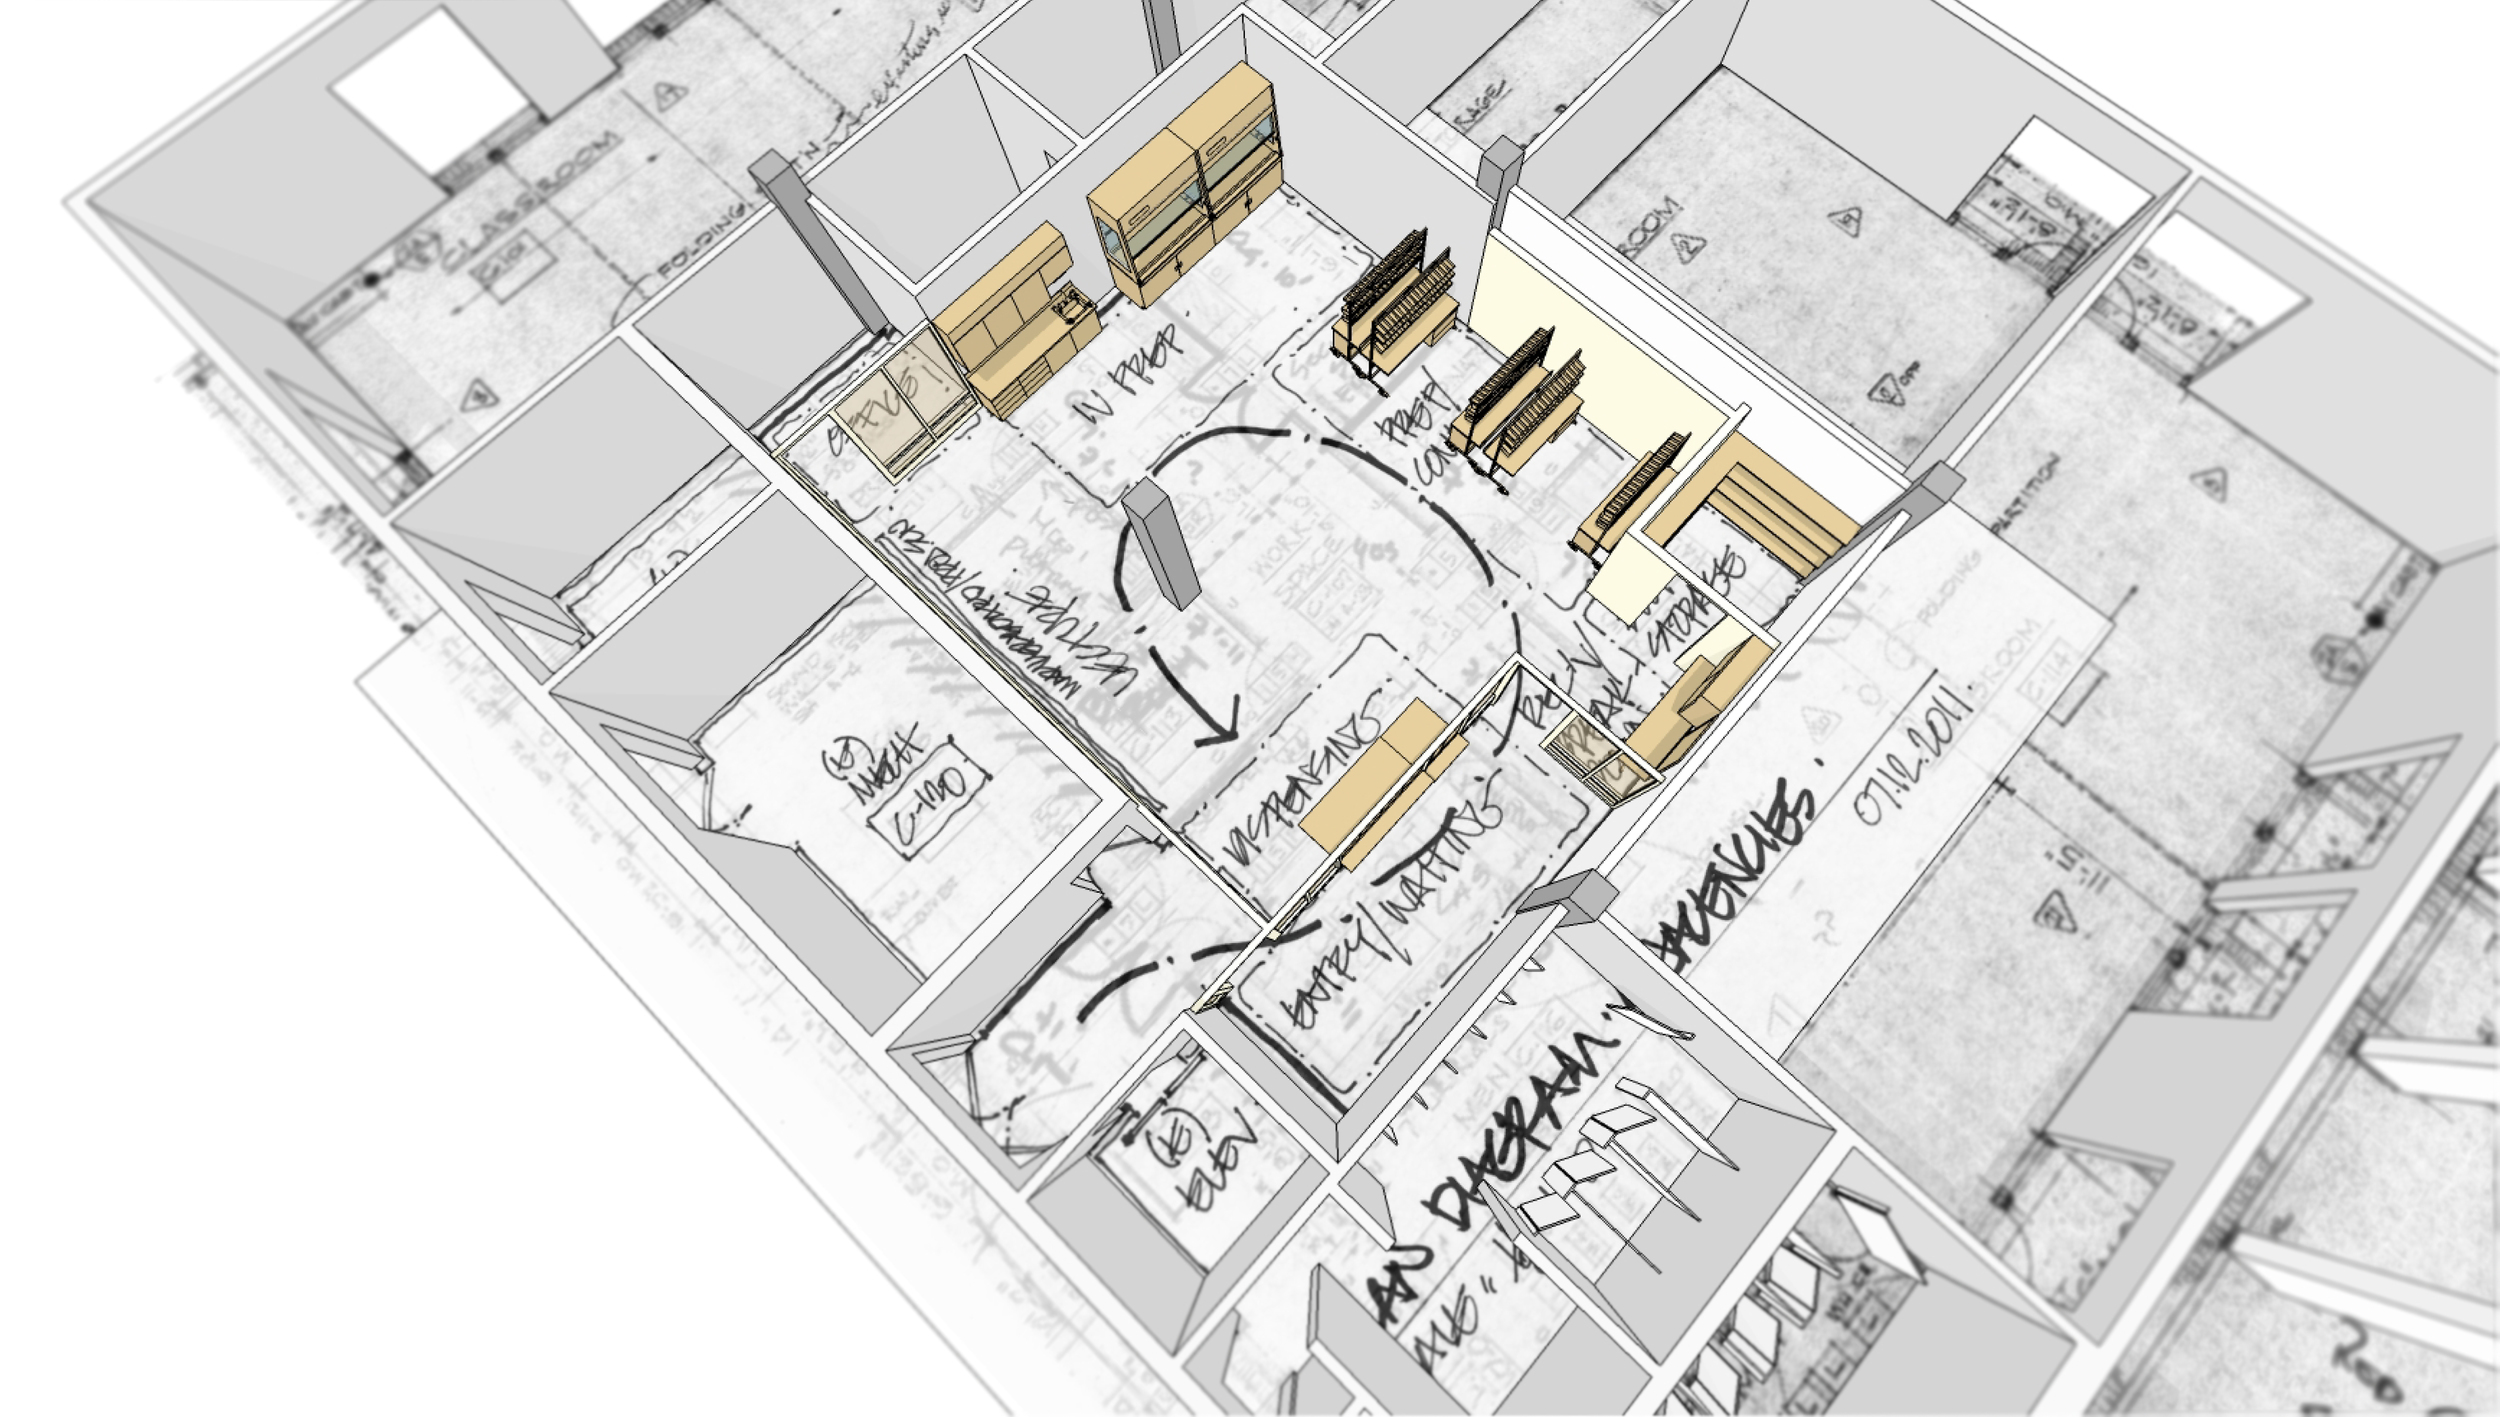 12 0517 planning sketch model.jpg